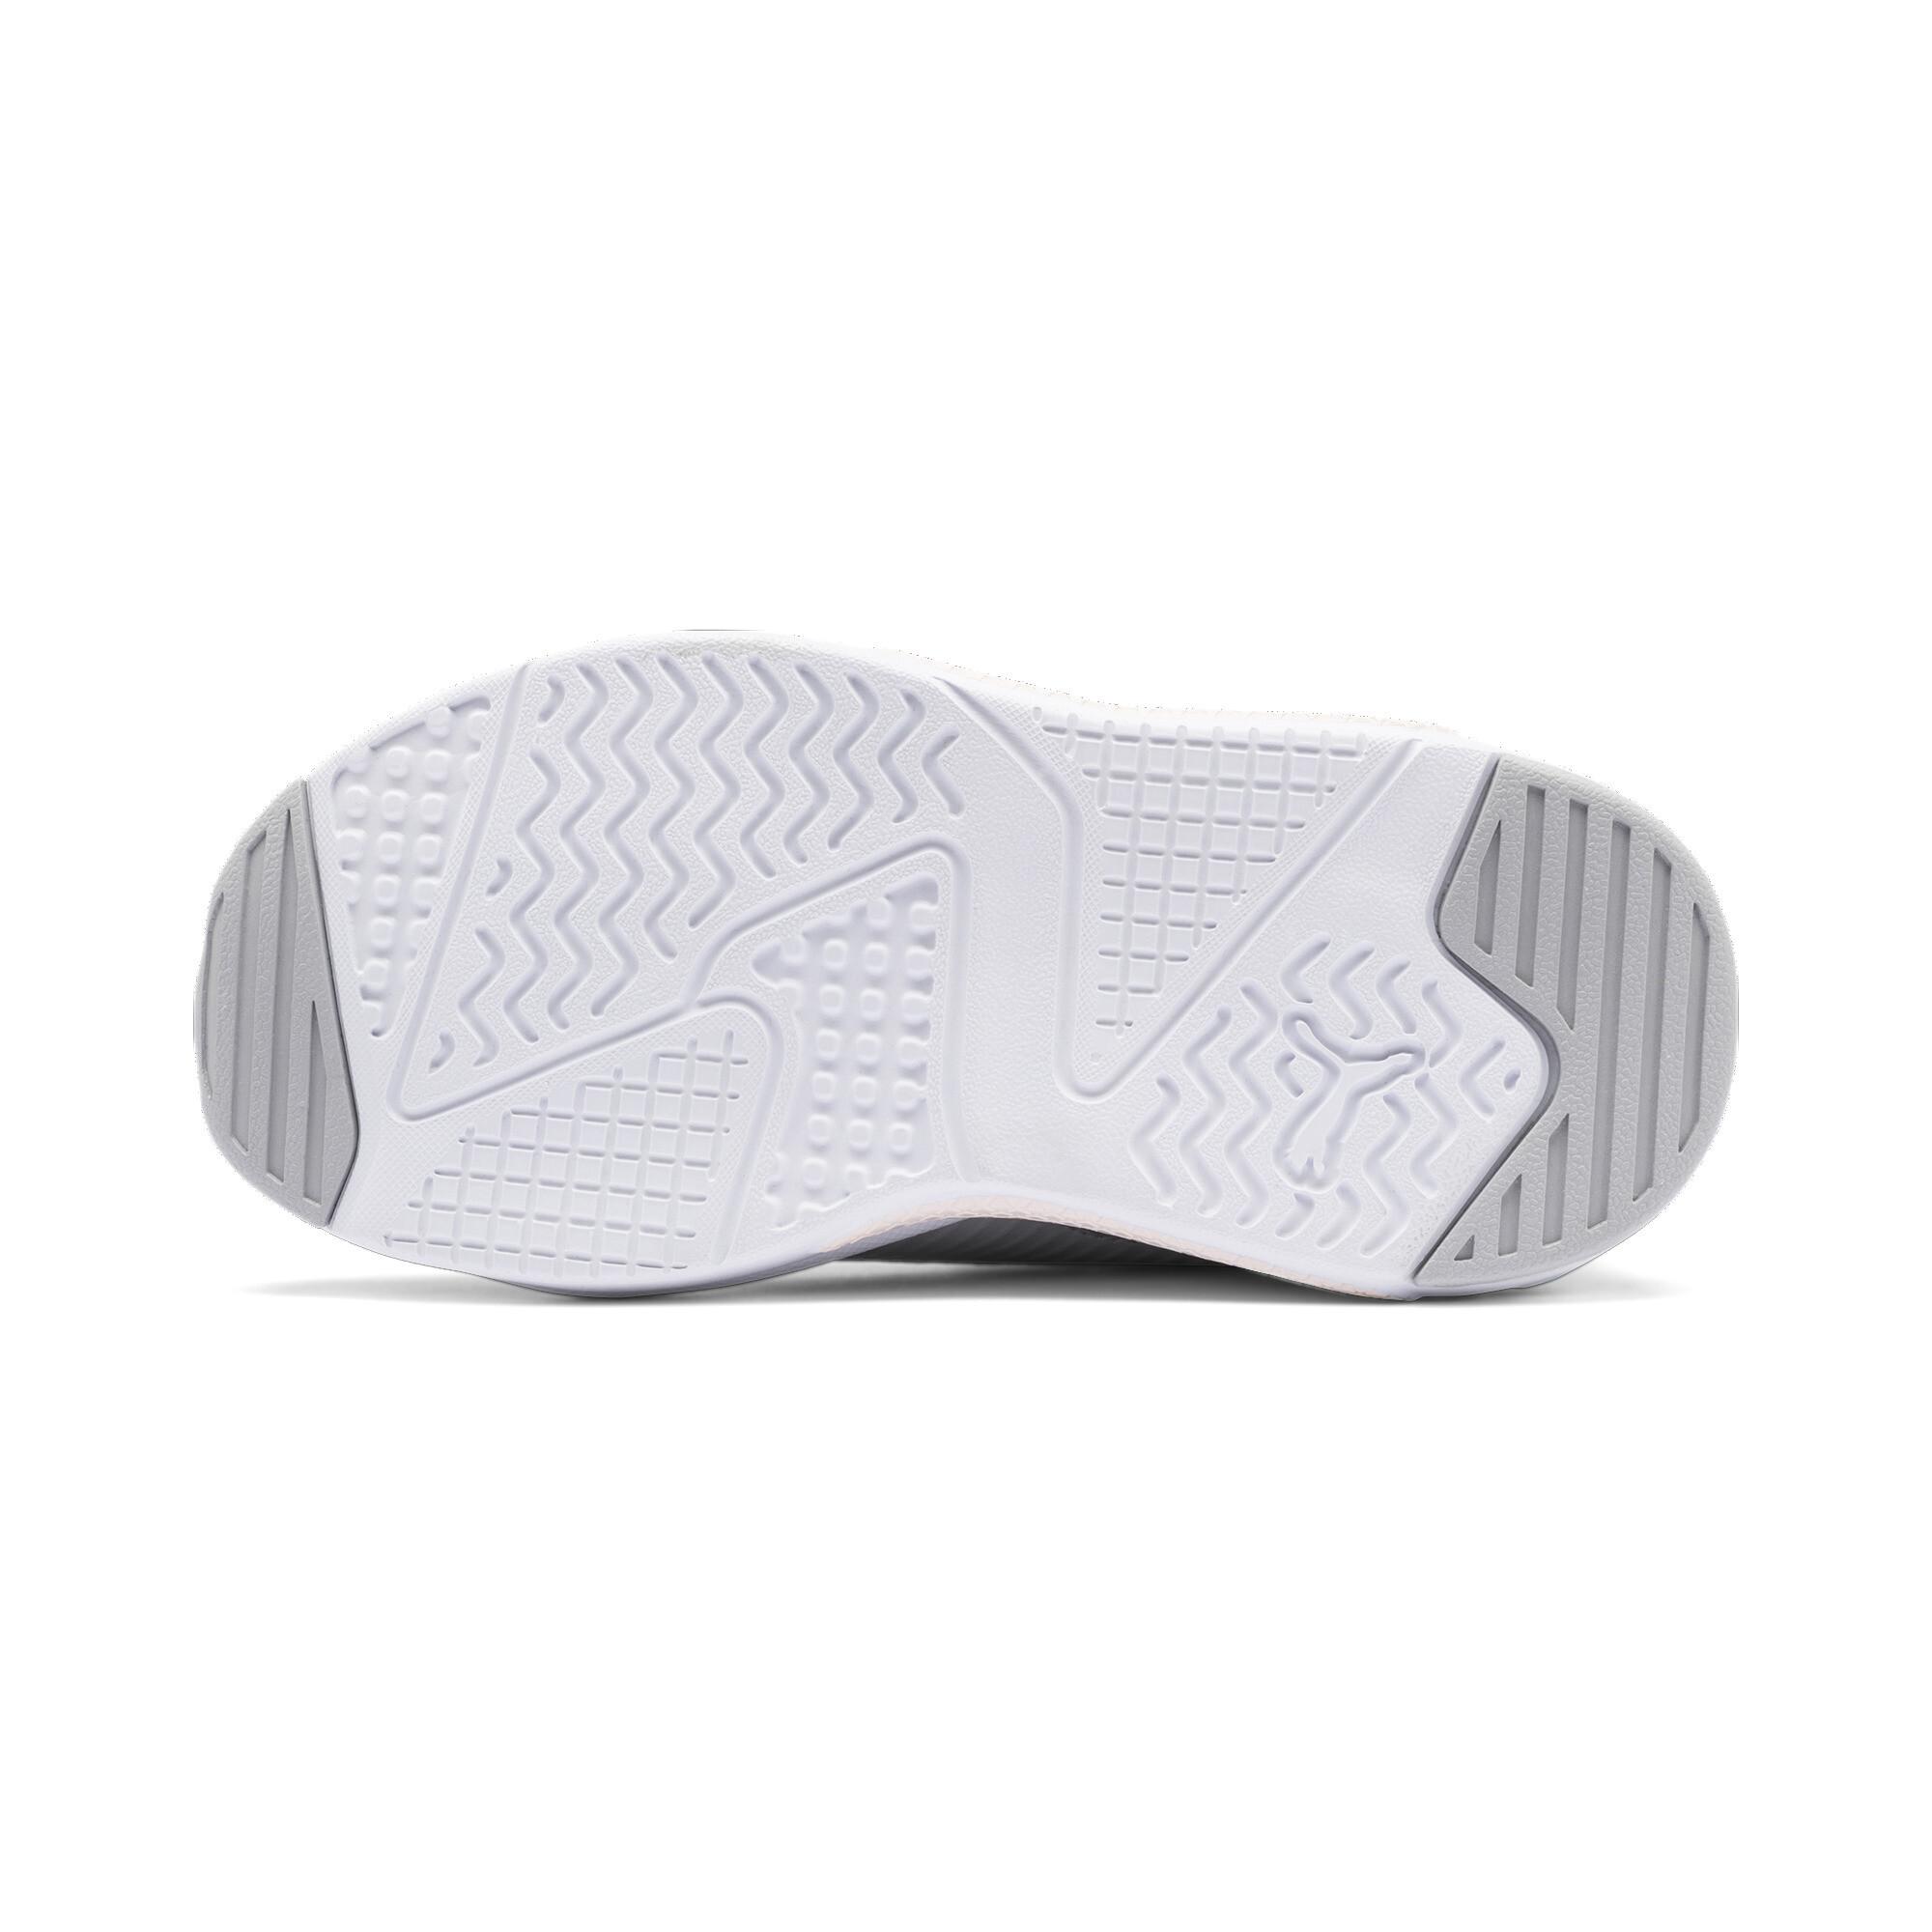 PUMA-X-RAY-Little-Kids-039-Shoes-Kids-Shoe-Kids thumbnail 5